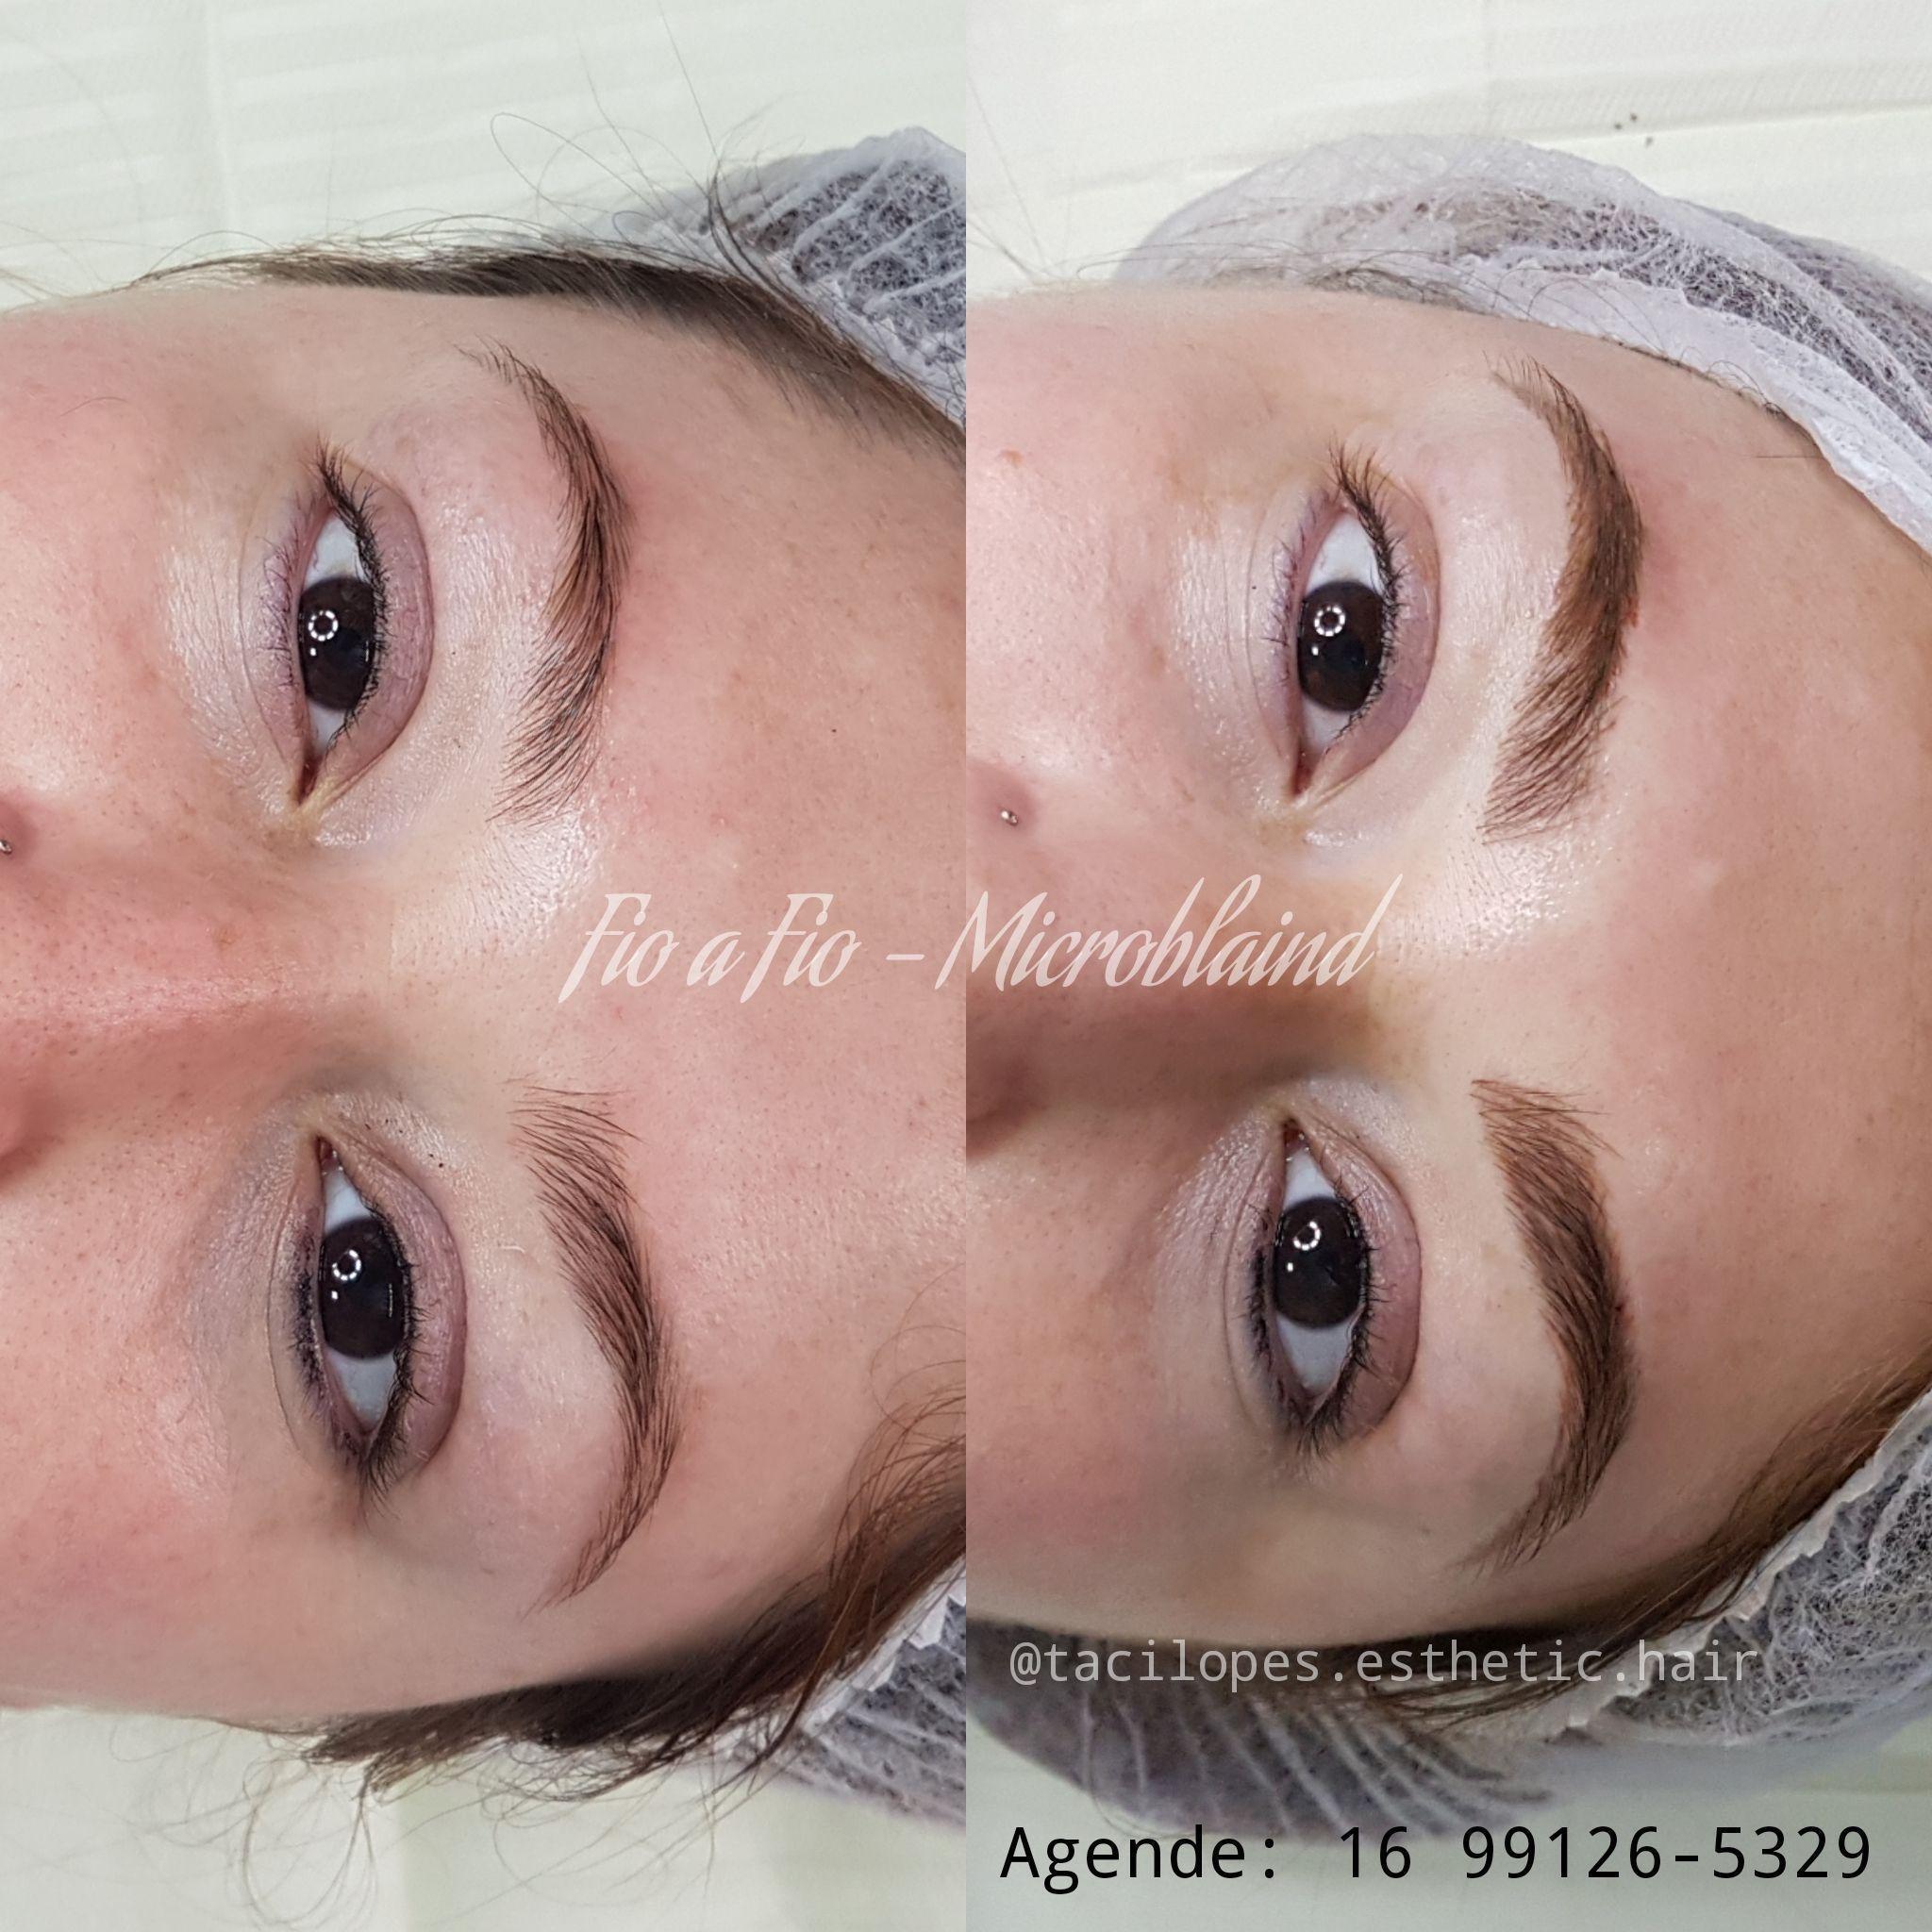 estética cabeleireiro(a) esteticista maquiador(a)